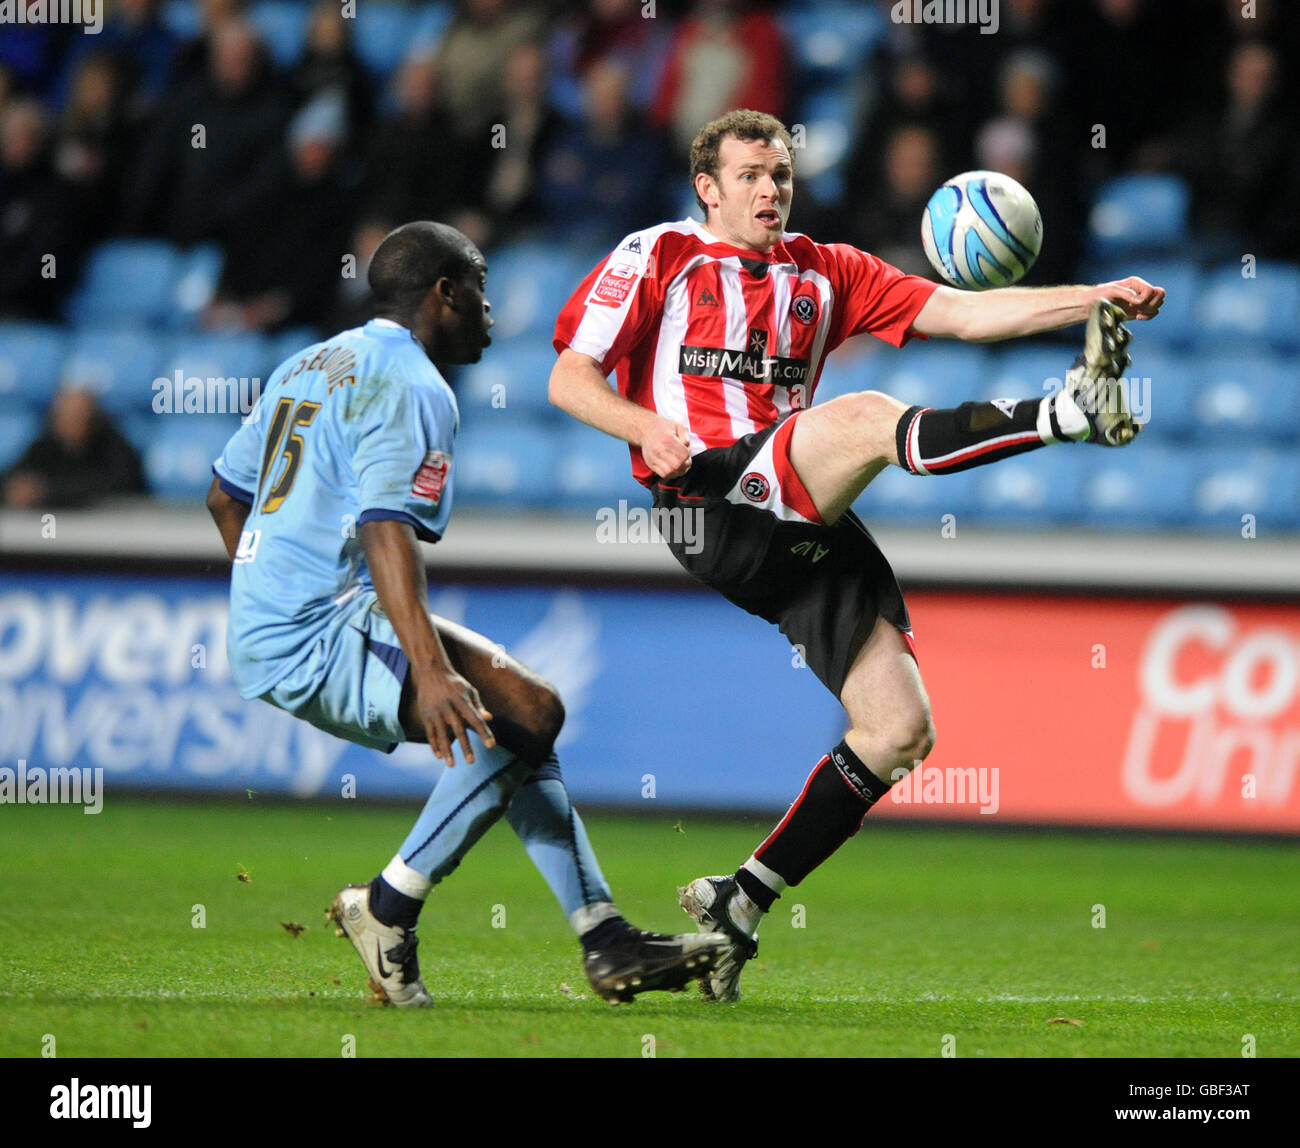 Soccer - Coca-Cola Football League Championship - Coventry City v Sheffield United - Ricoh Arena - Stock Image